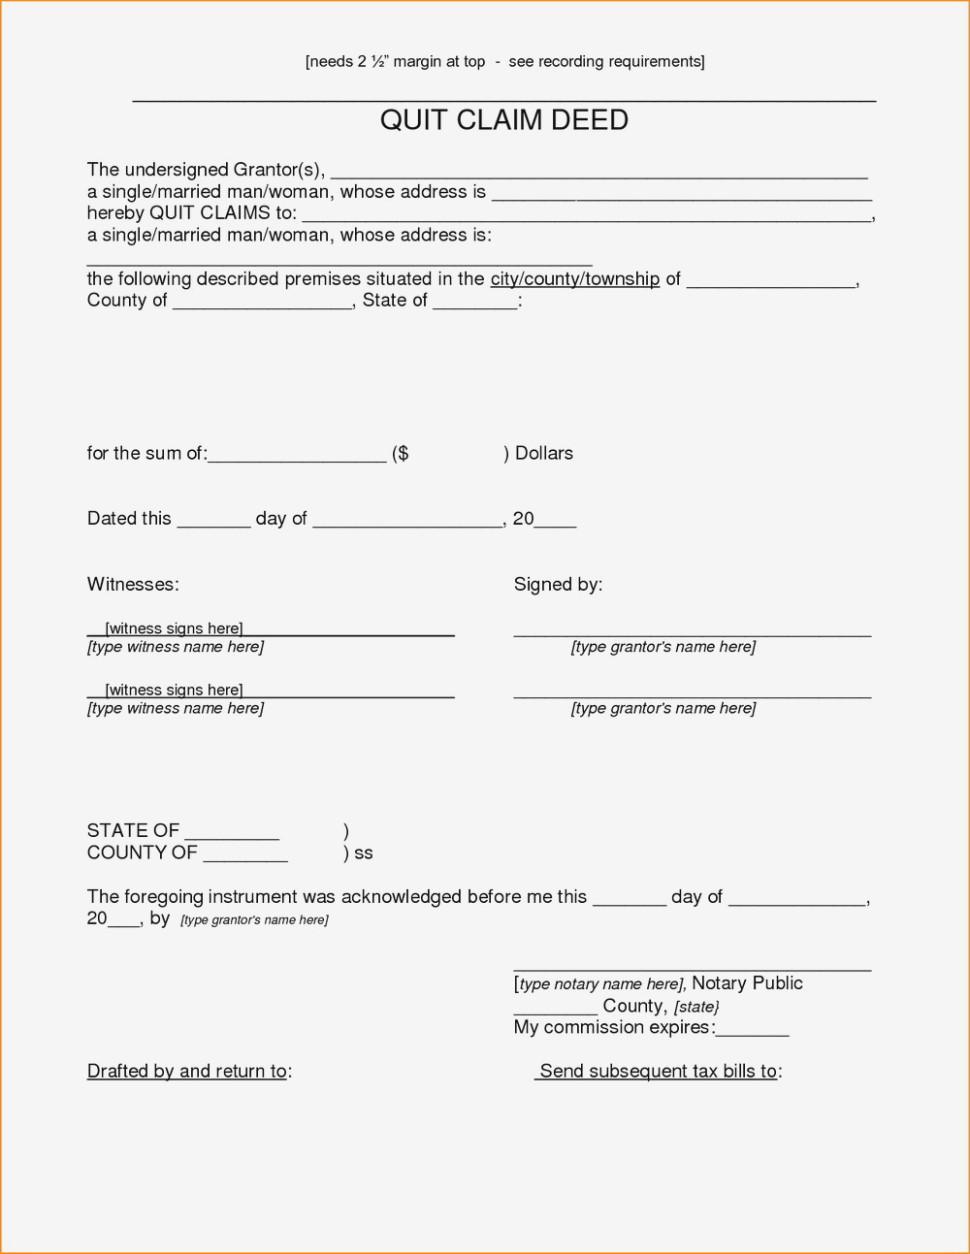 Arizona Quit Claim Form Free